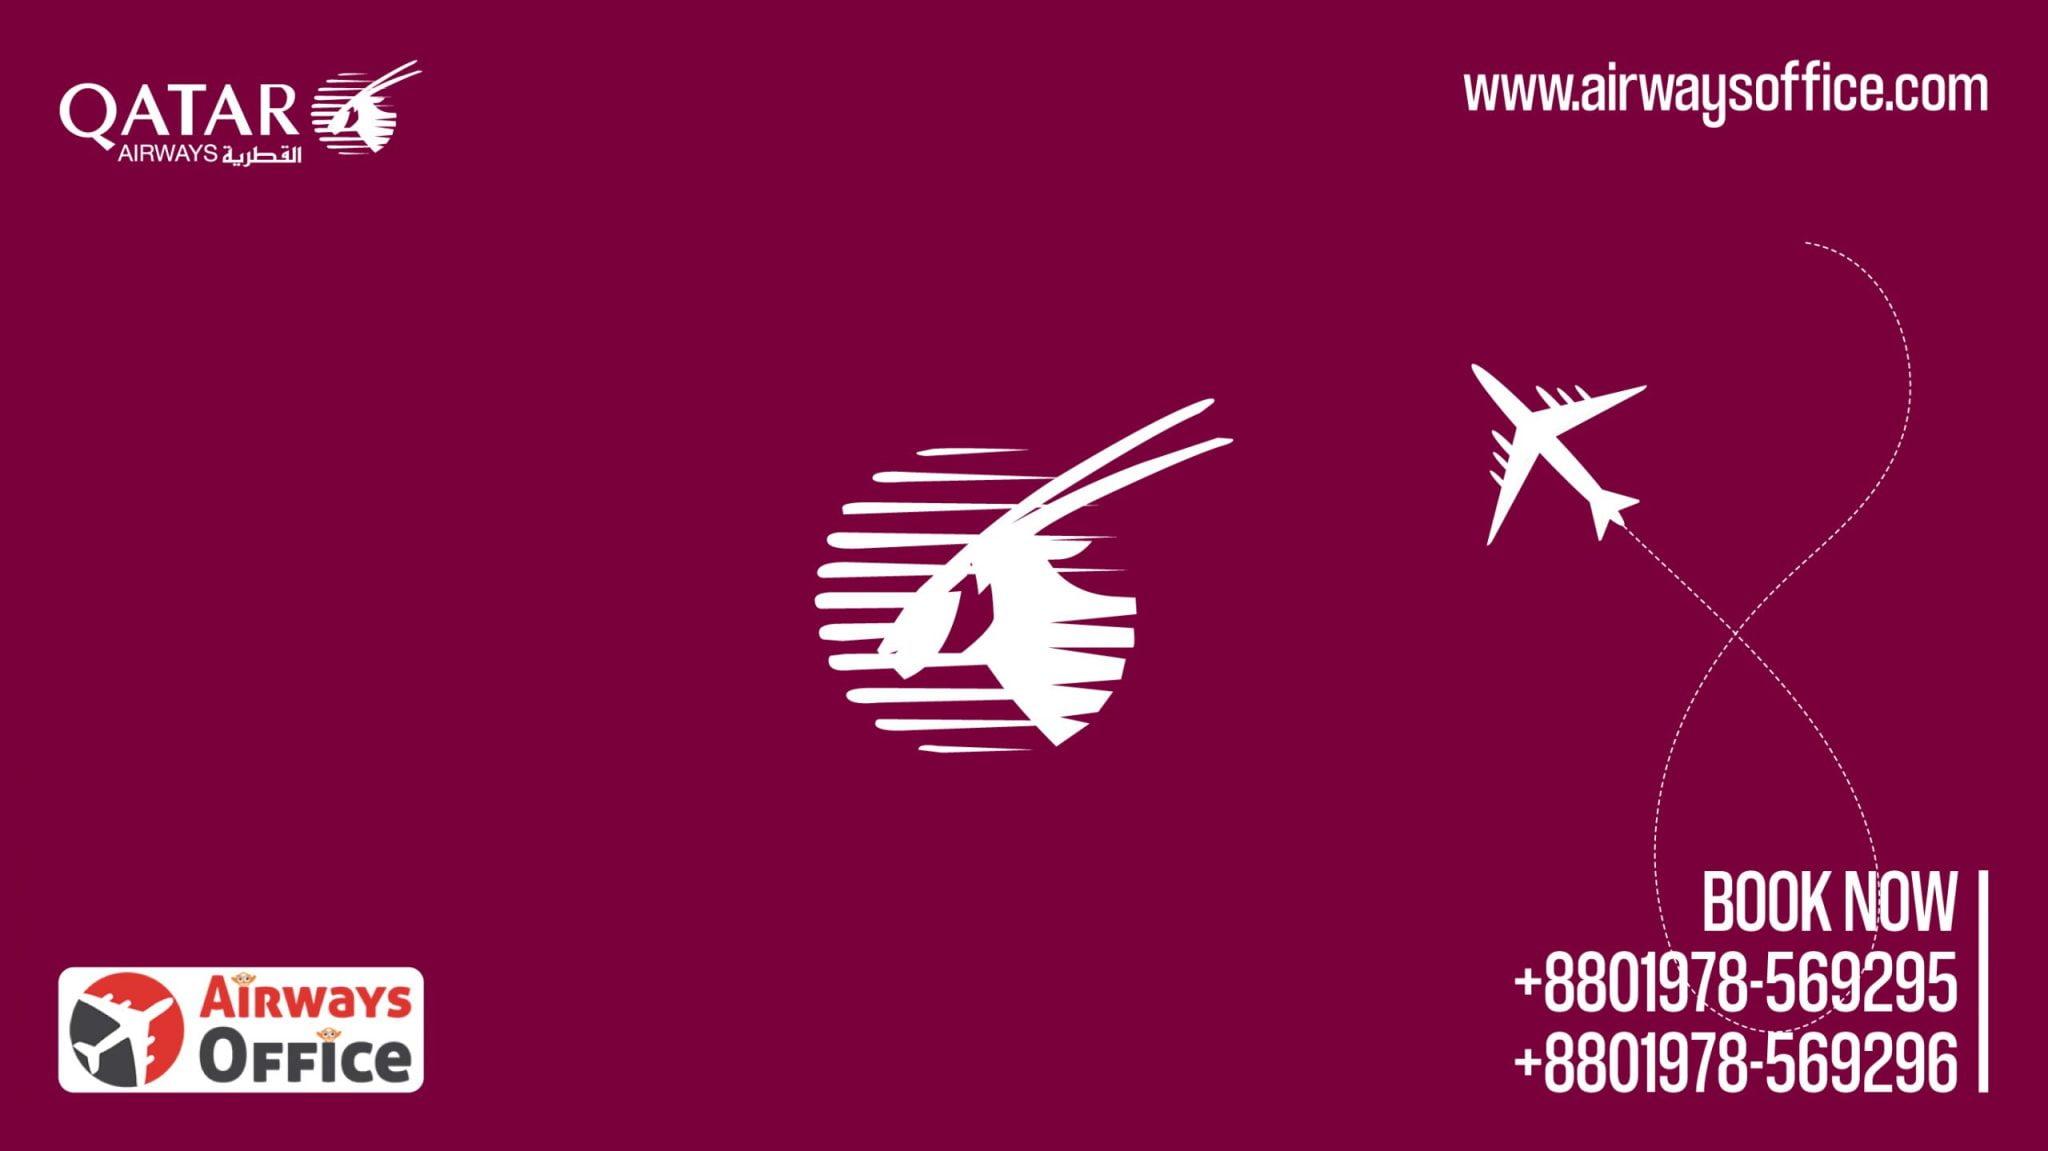 Qatar Airways Sales Office Dhaka, Bangladesh